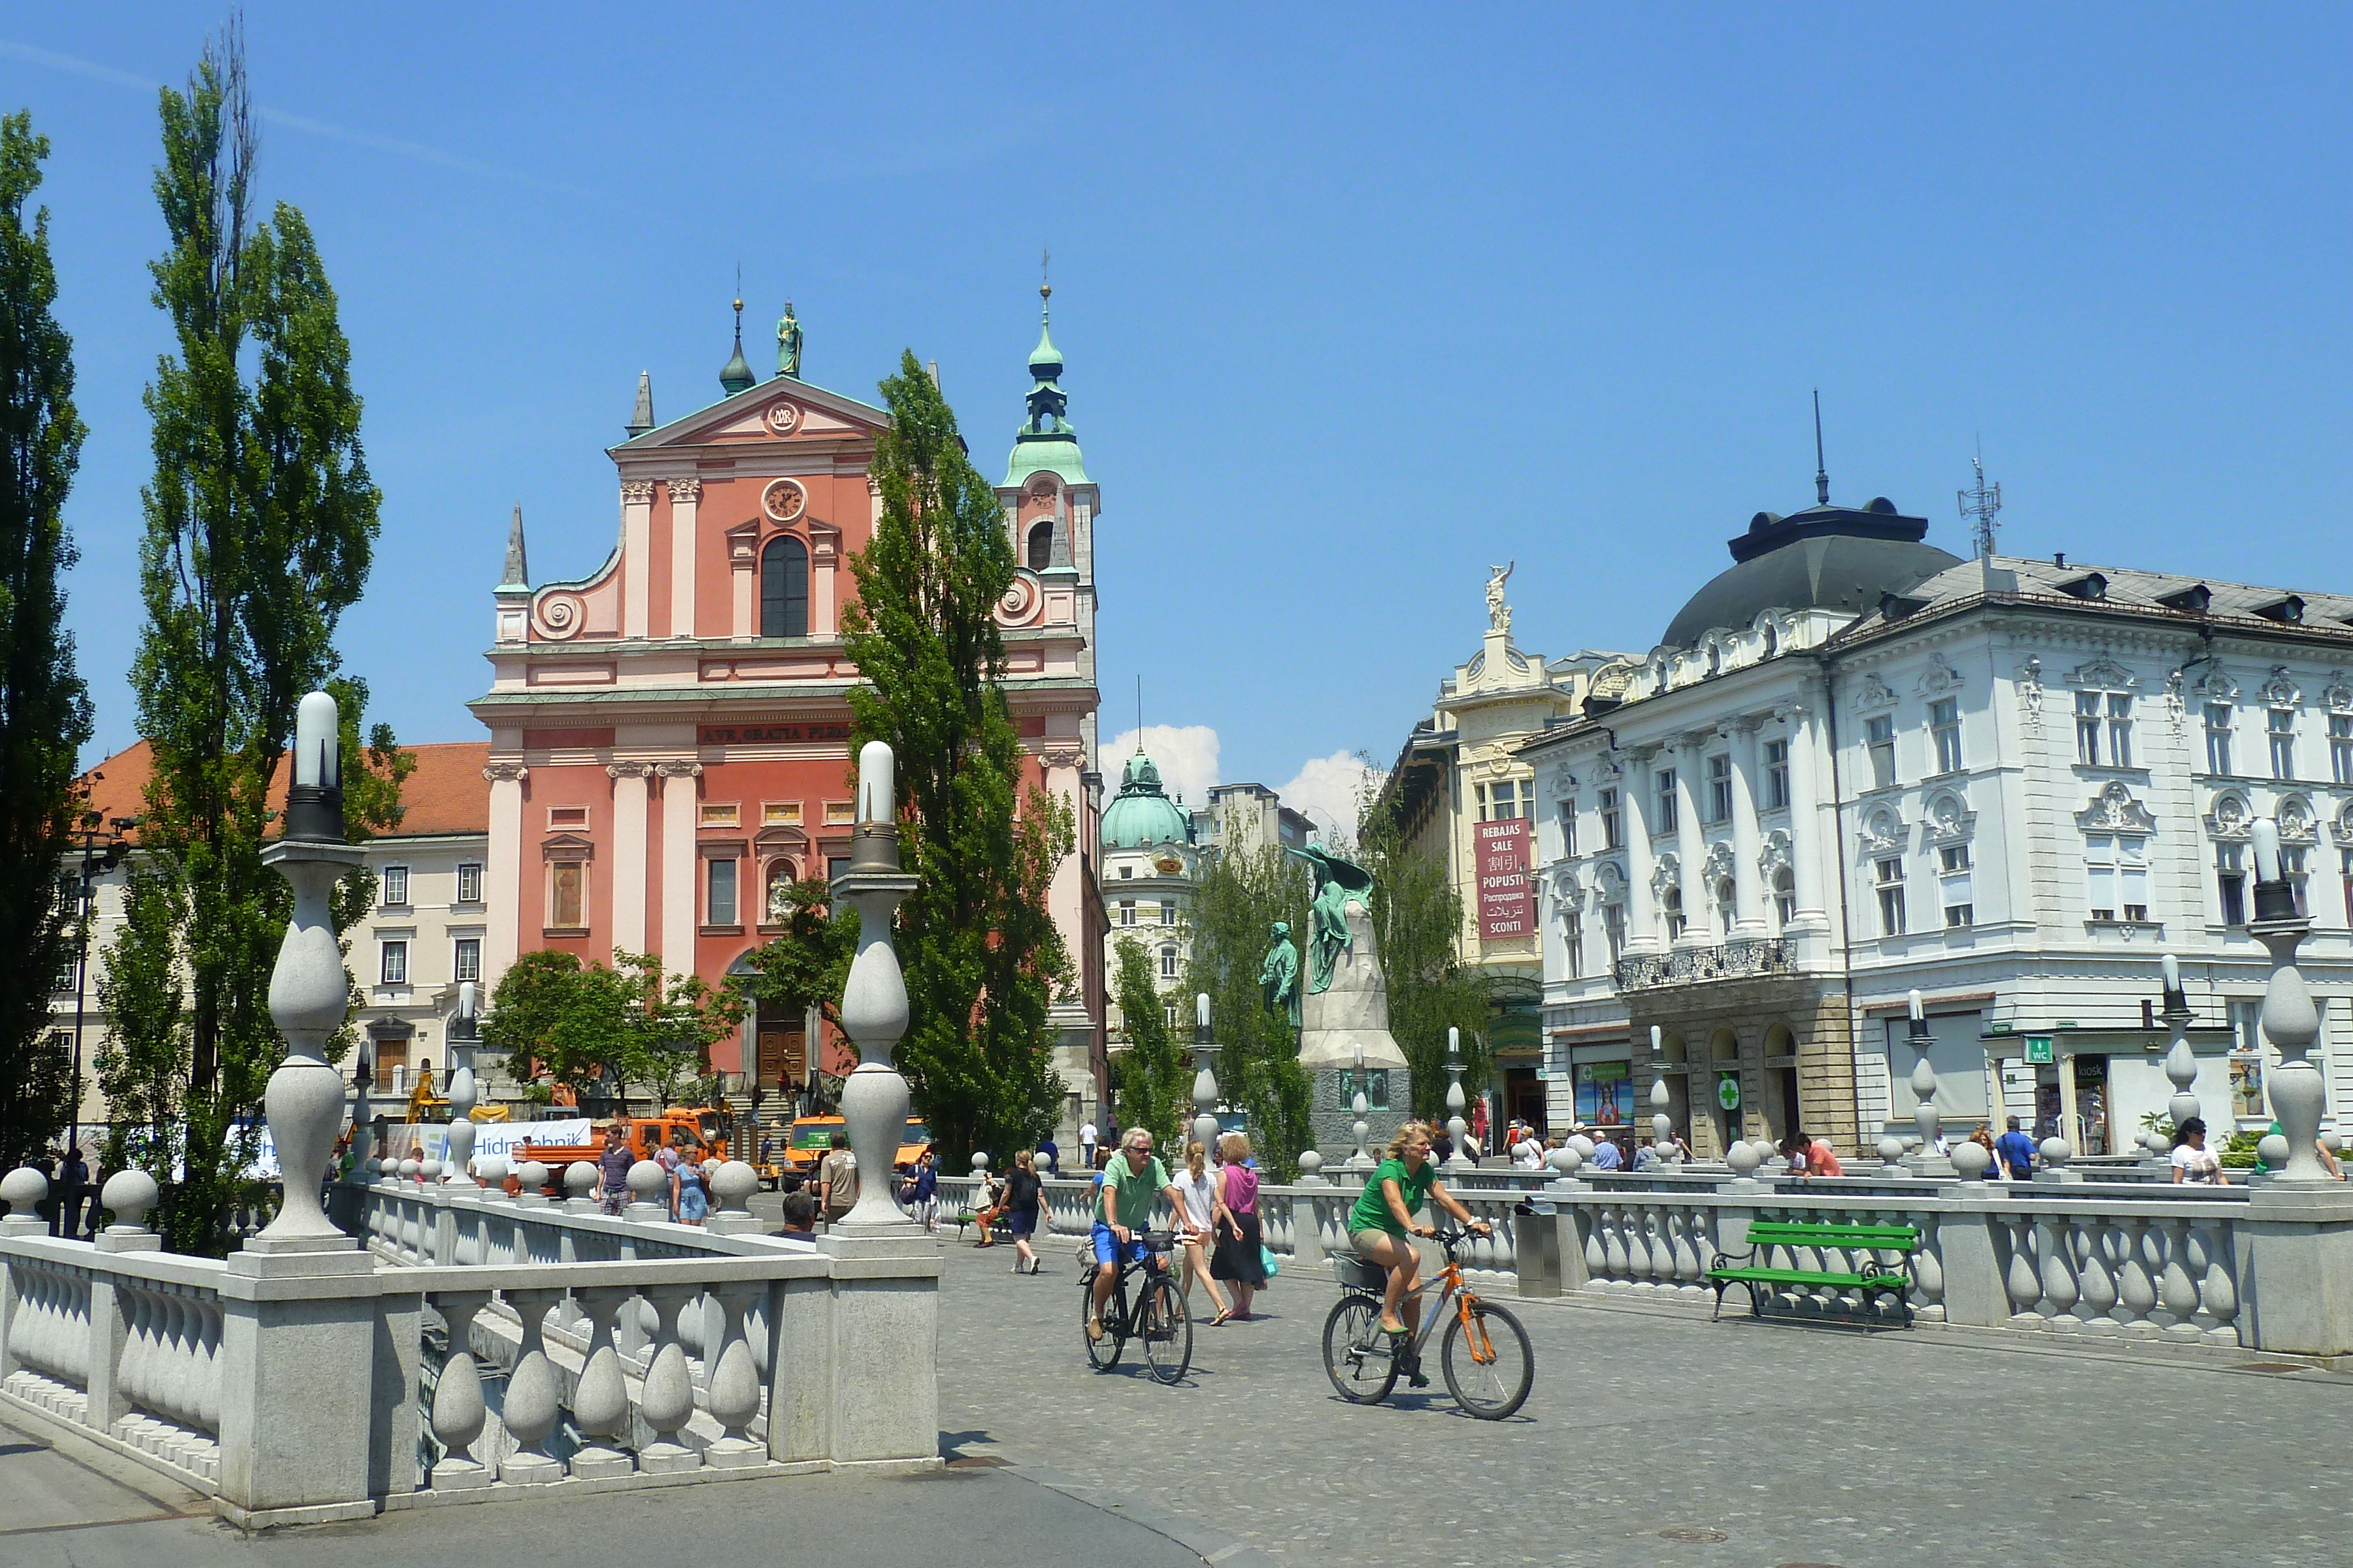 Stedentrips stad en natuur Ljubljana - Slovenie - Reisvlinder.nl